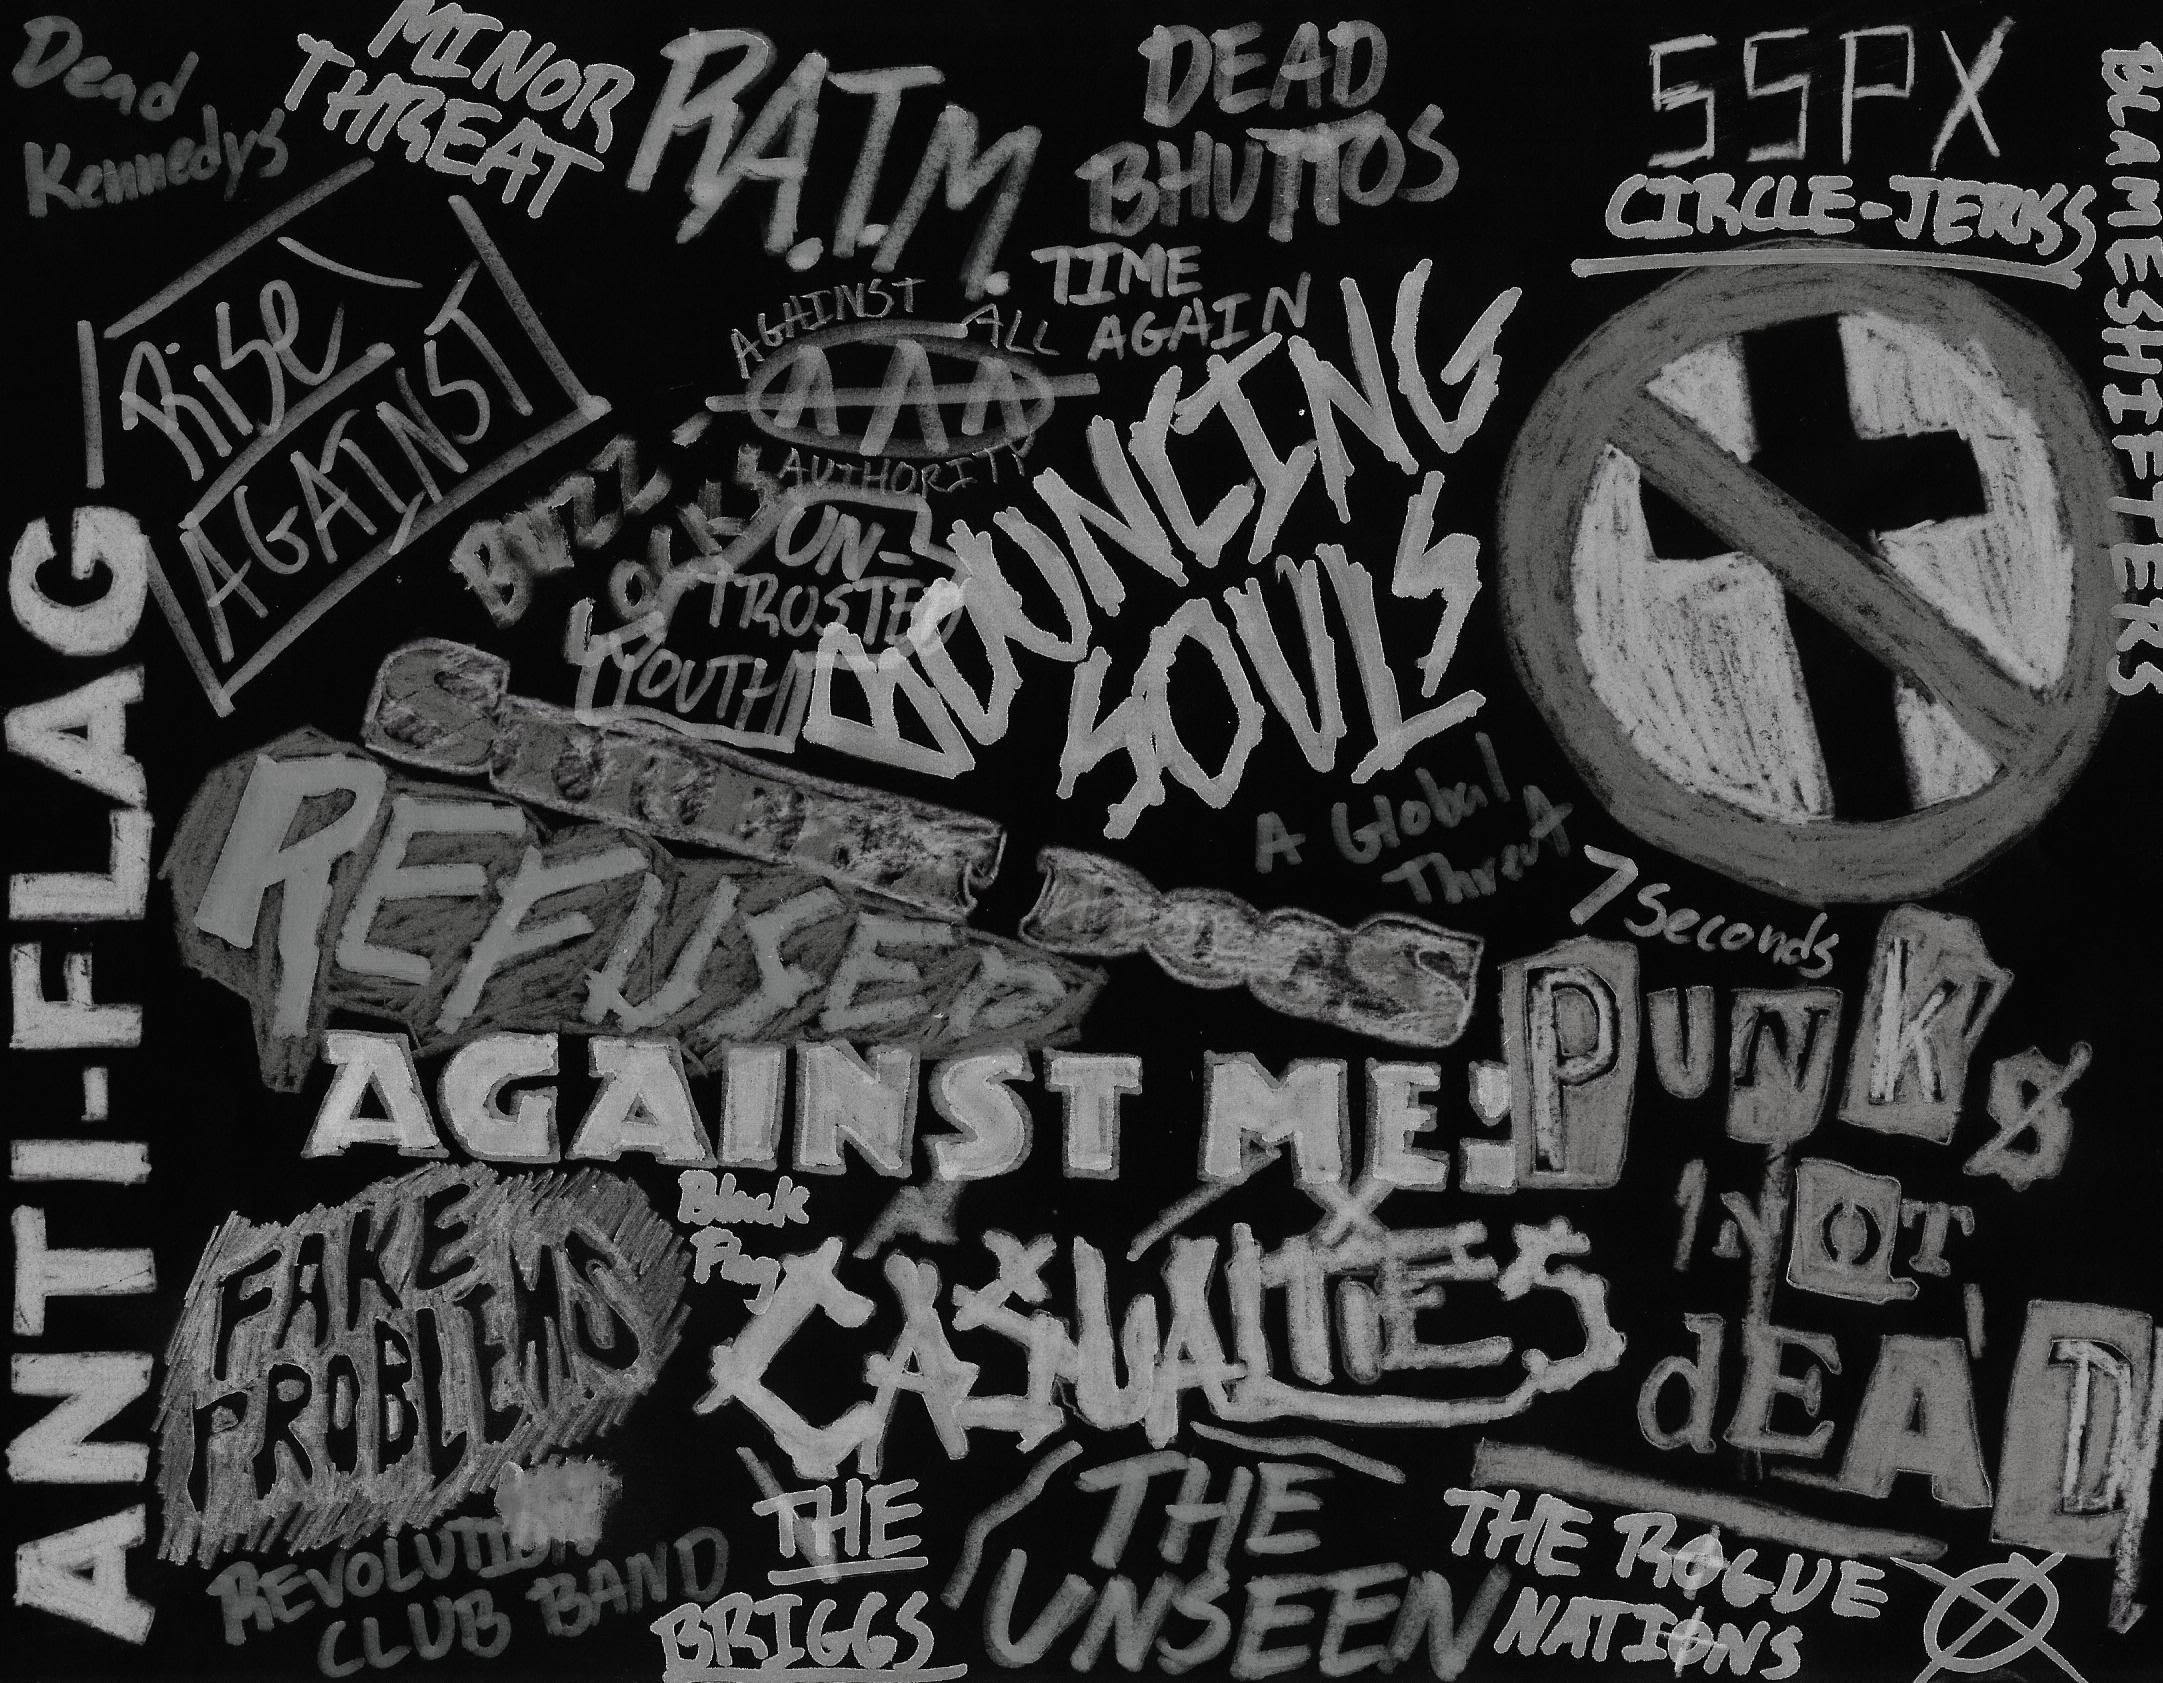 Punk rock backgrounds 53 images - Wallpaper artist music ...